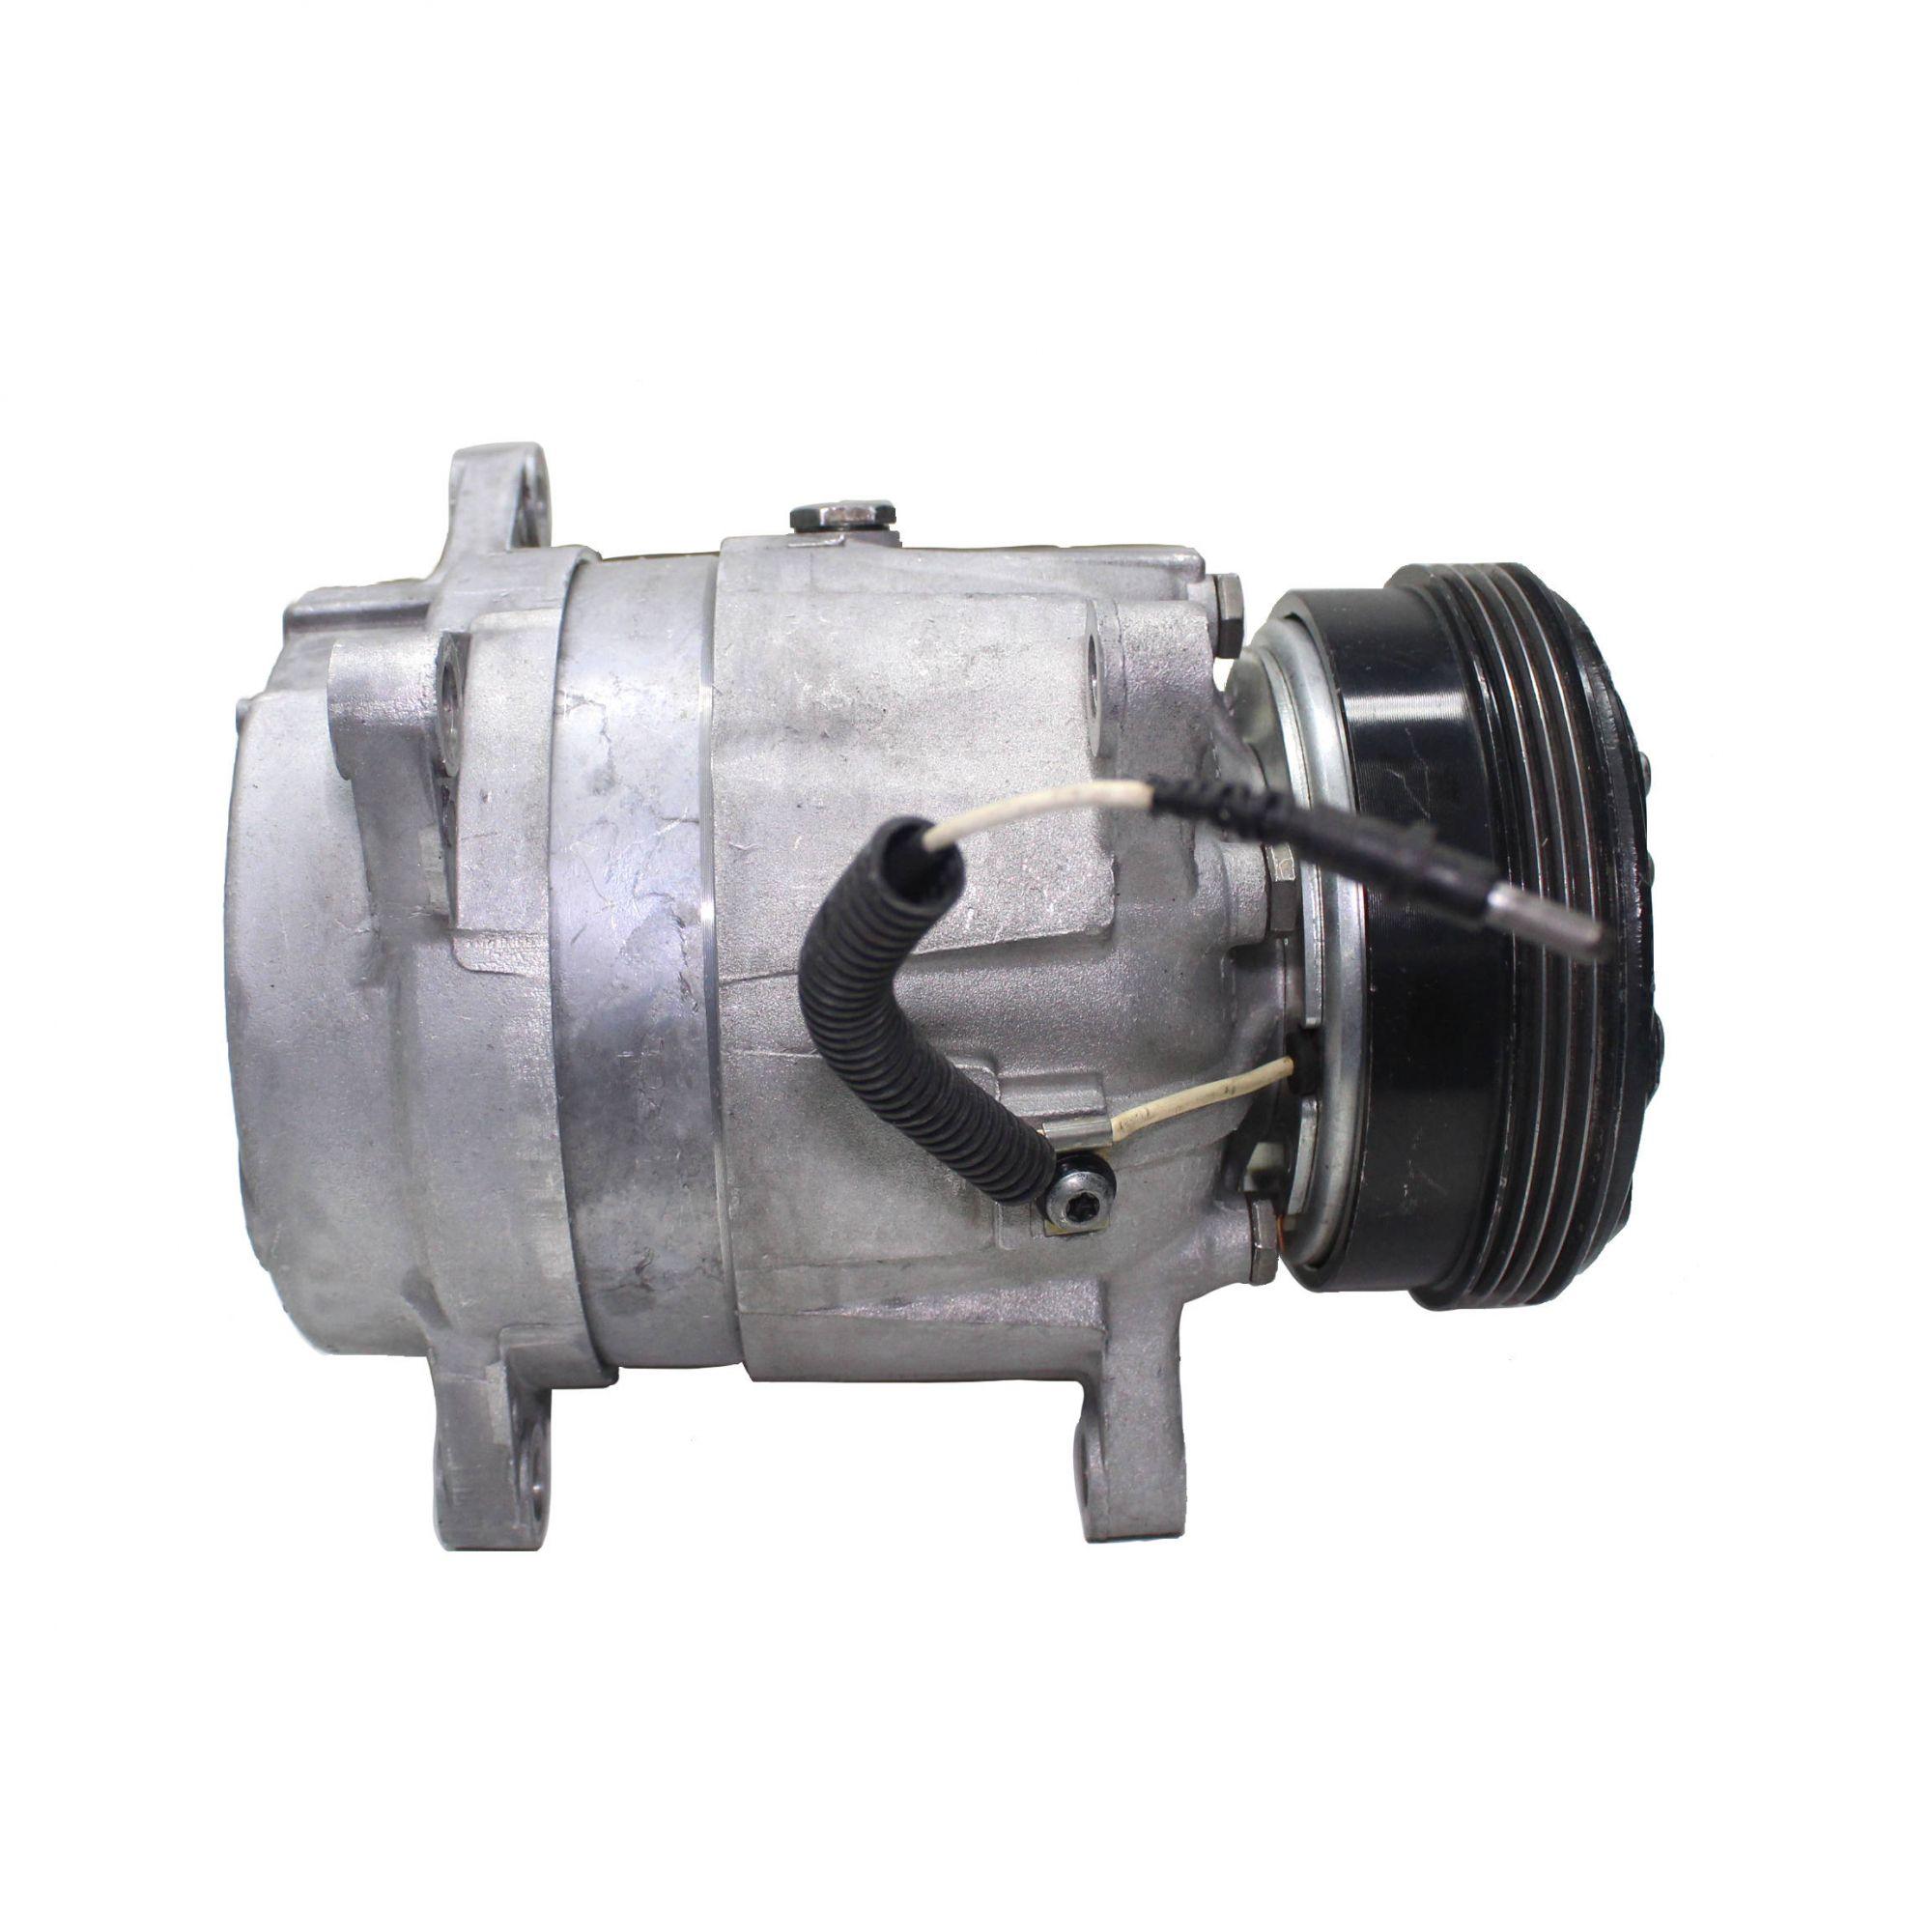 Compressor Ar Condicionado Renault Scenic 1.6 16v  97...99